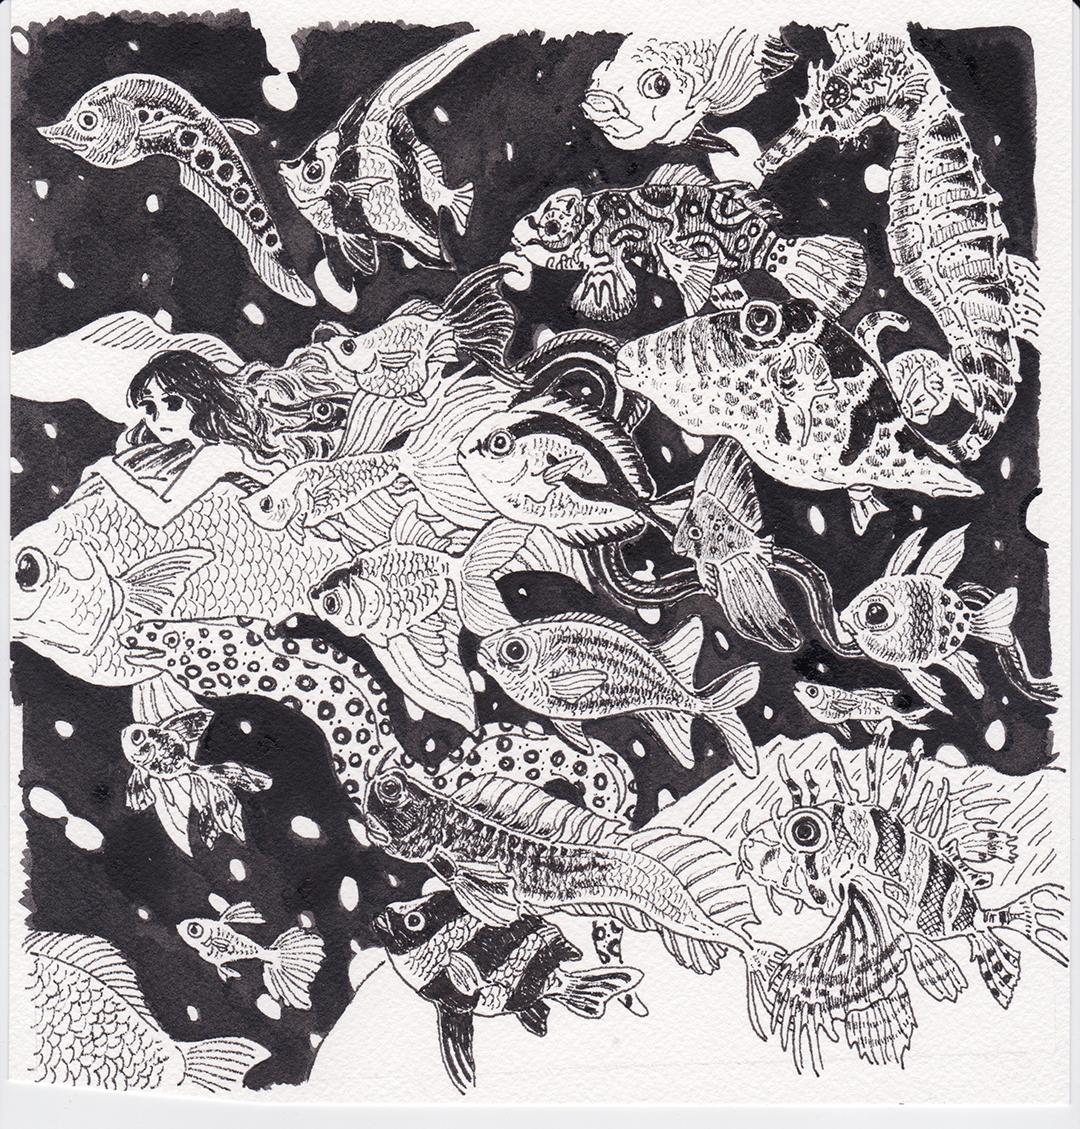 GirlsclubAsia-Illustrator-In Wave_Lisa Kogawa